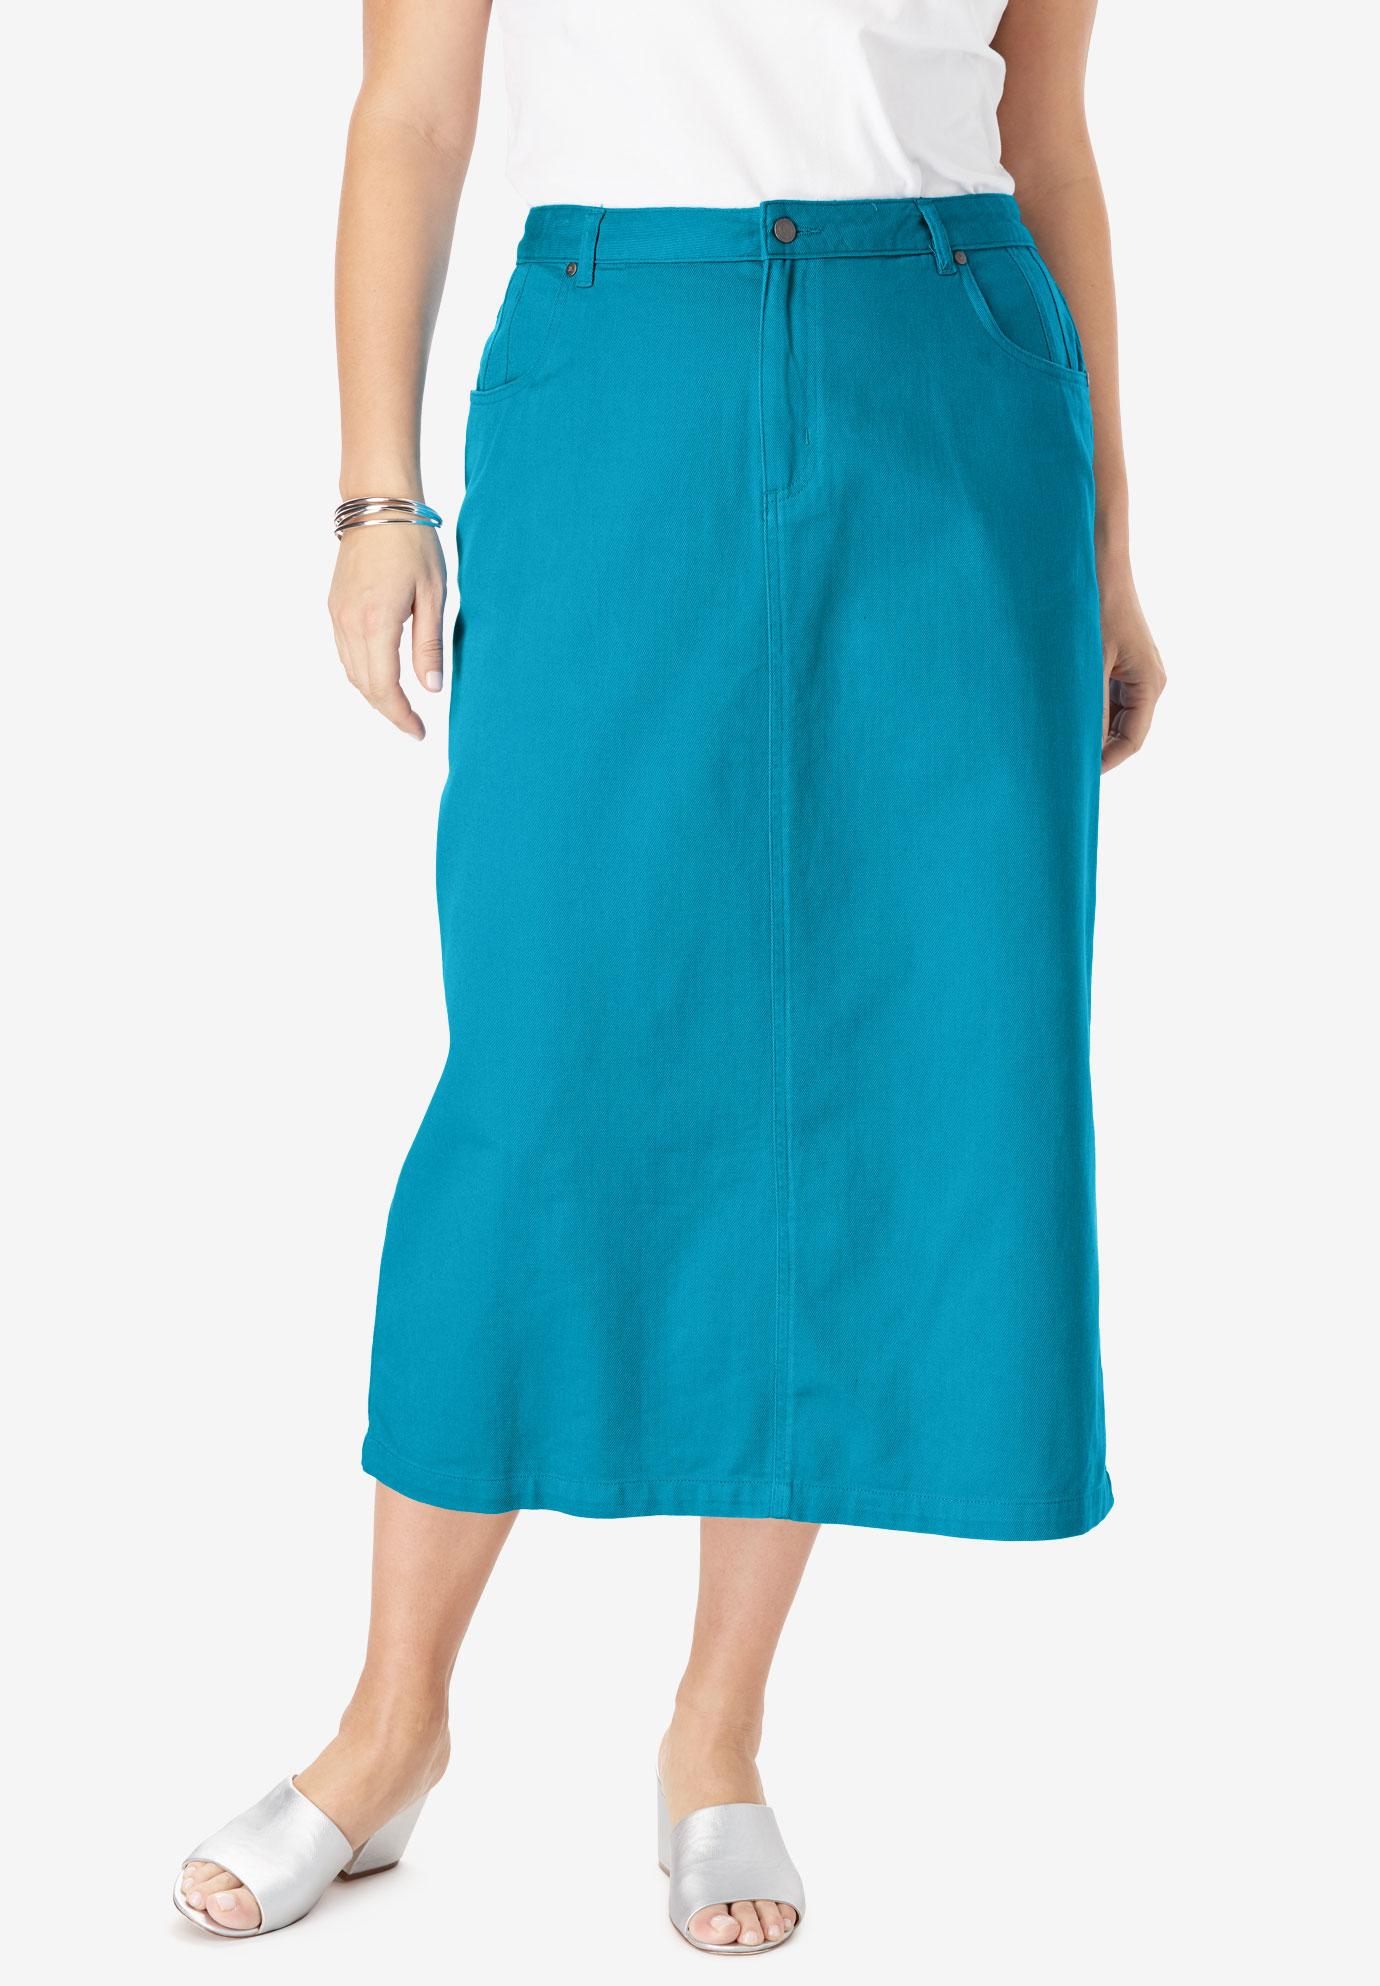 da84ec8bd0 Classic Cotton Denim Long Skirt| Plus Size Skirts | Jessica London